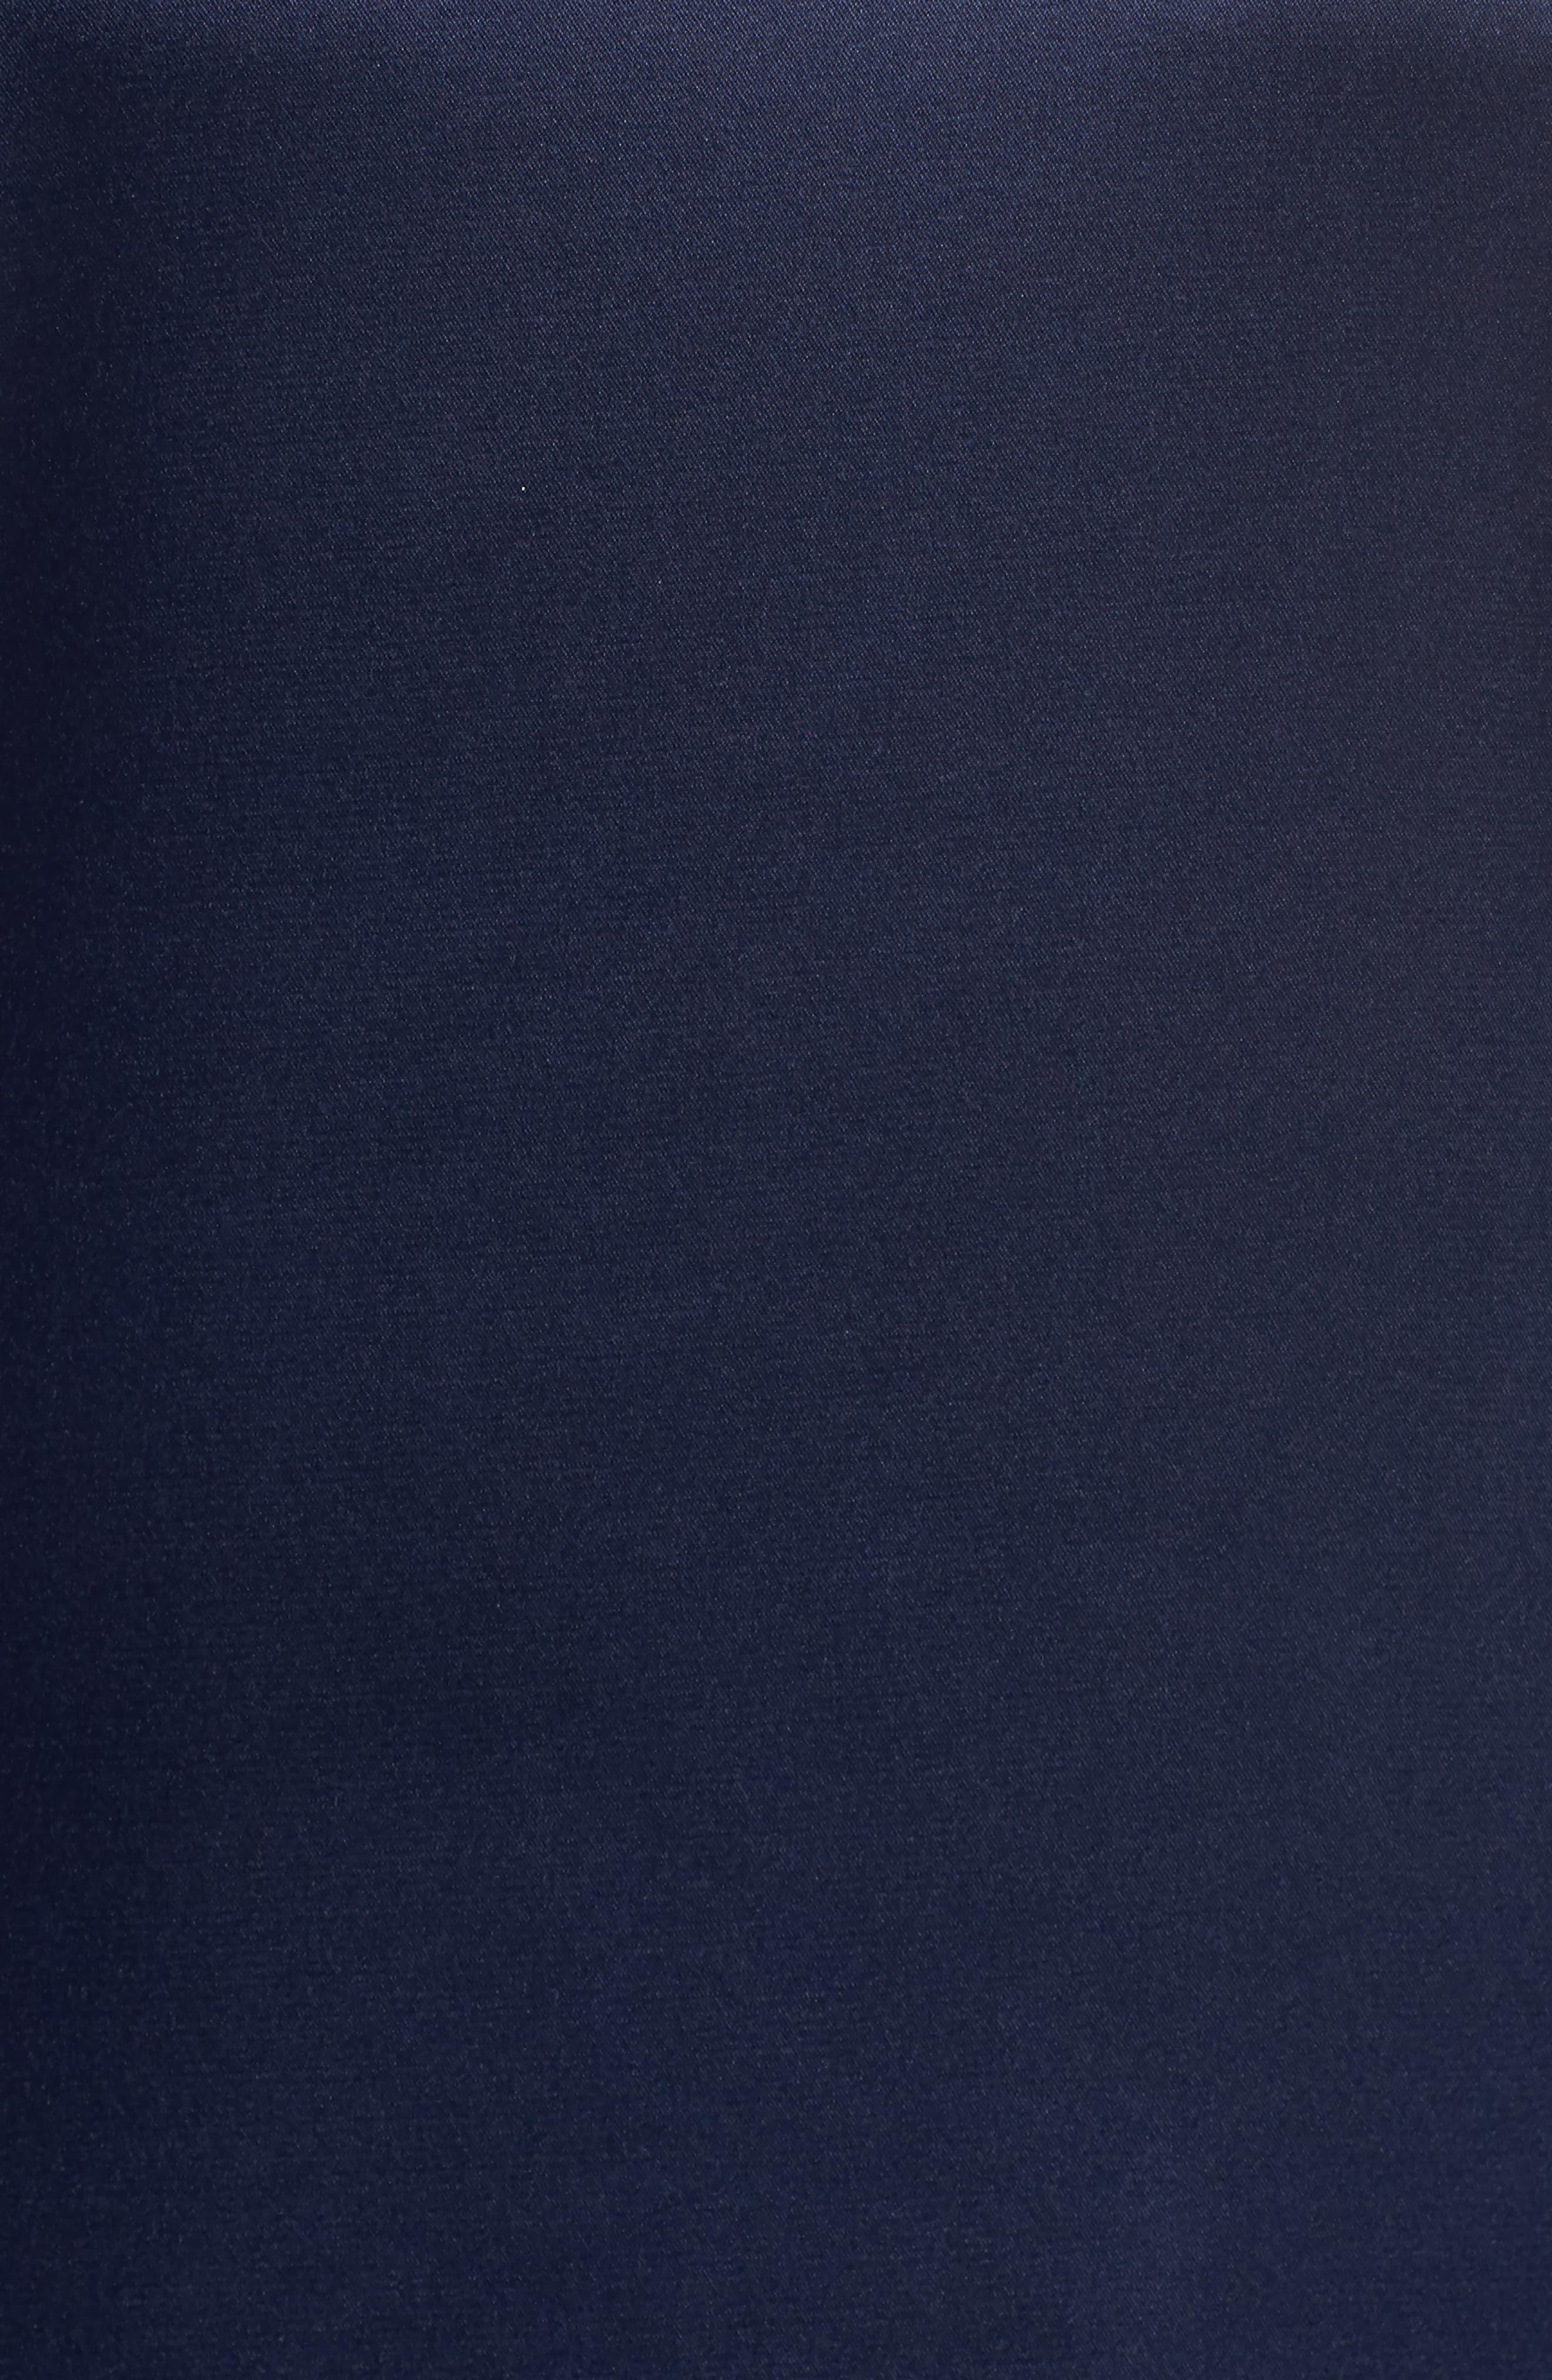 One-Sleeve Shift Dress,                             Alternate thumbnail 9, color,